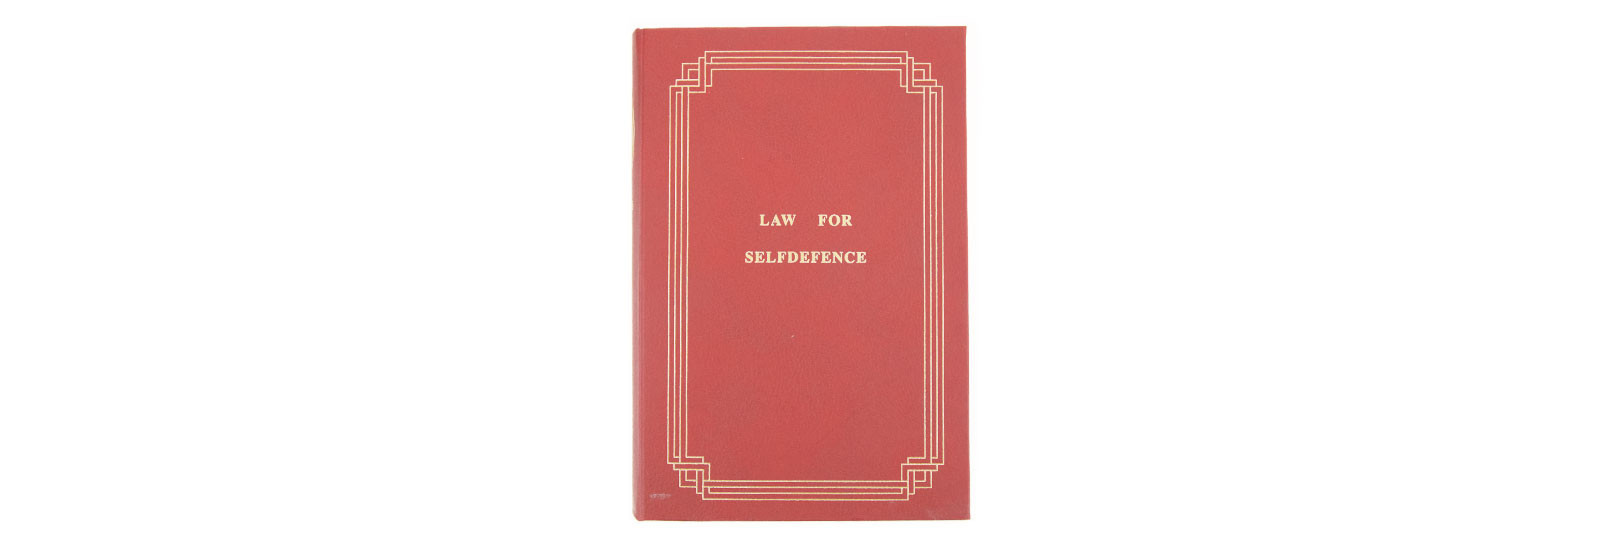 Derringer book case